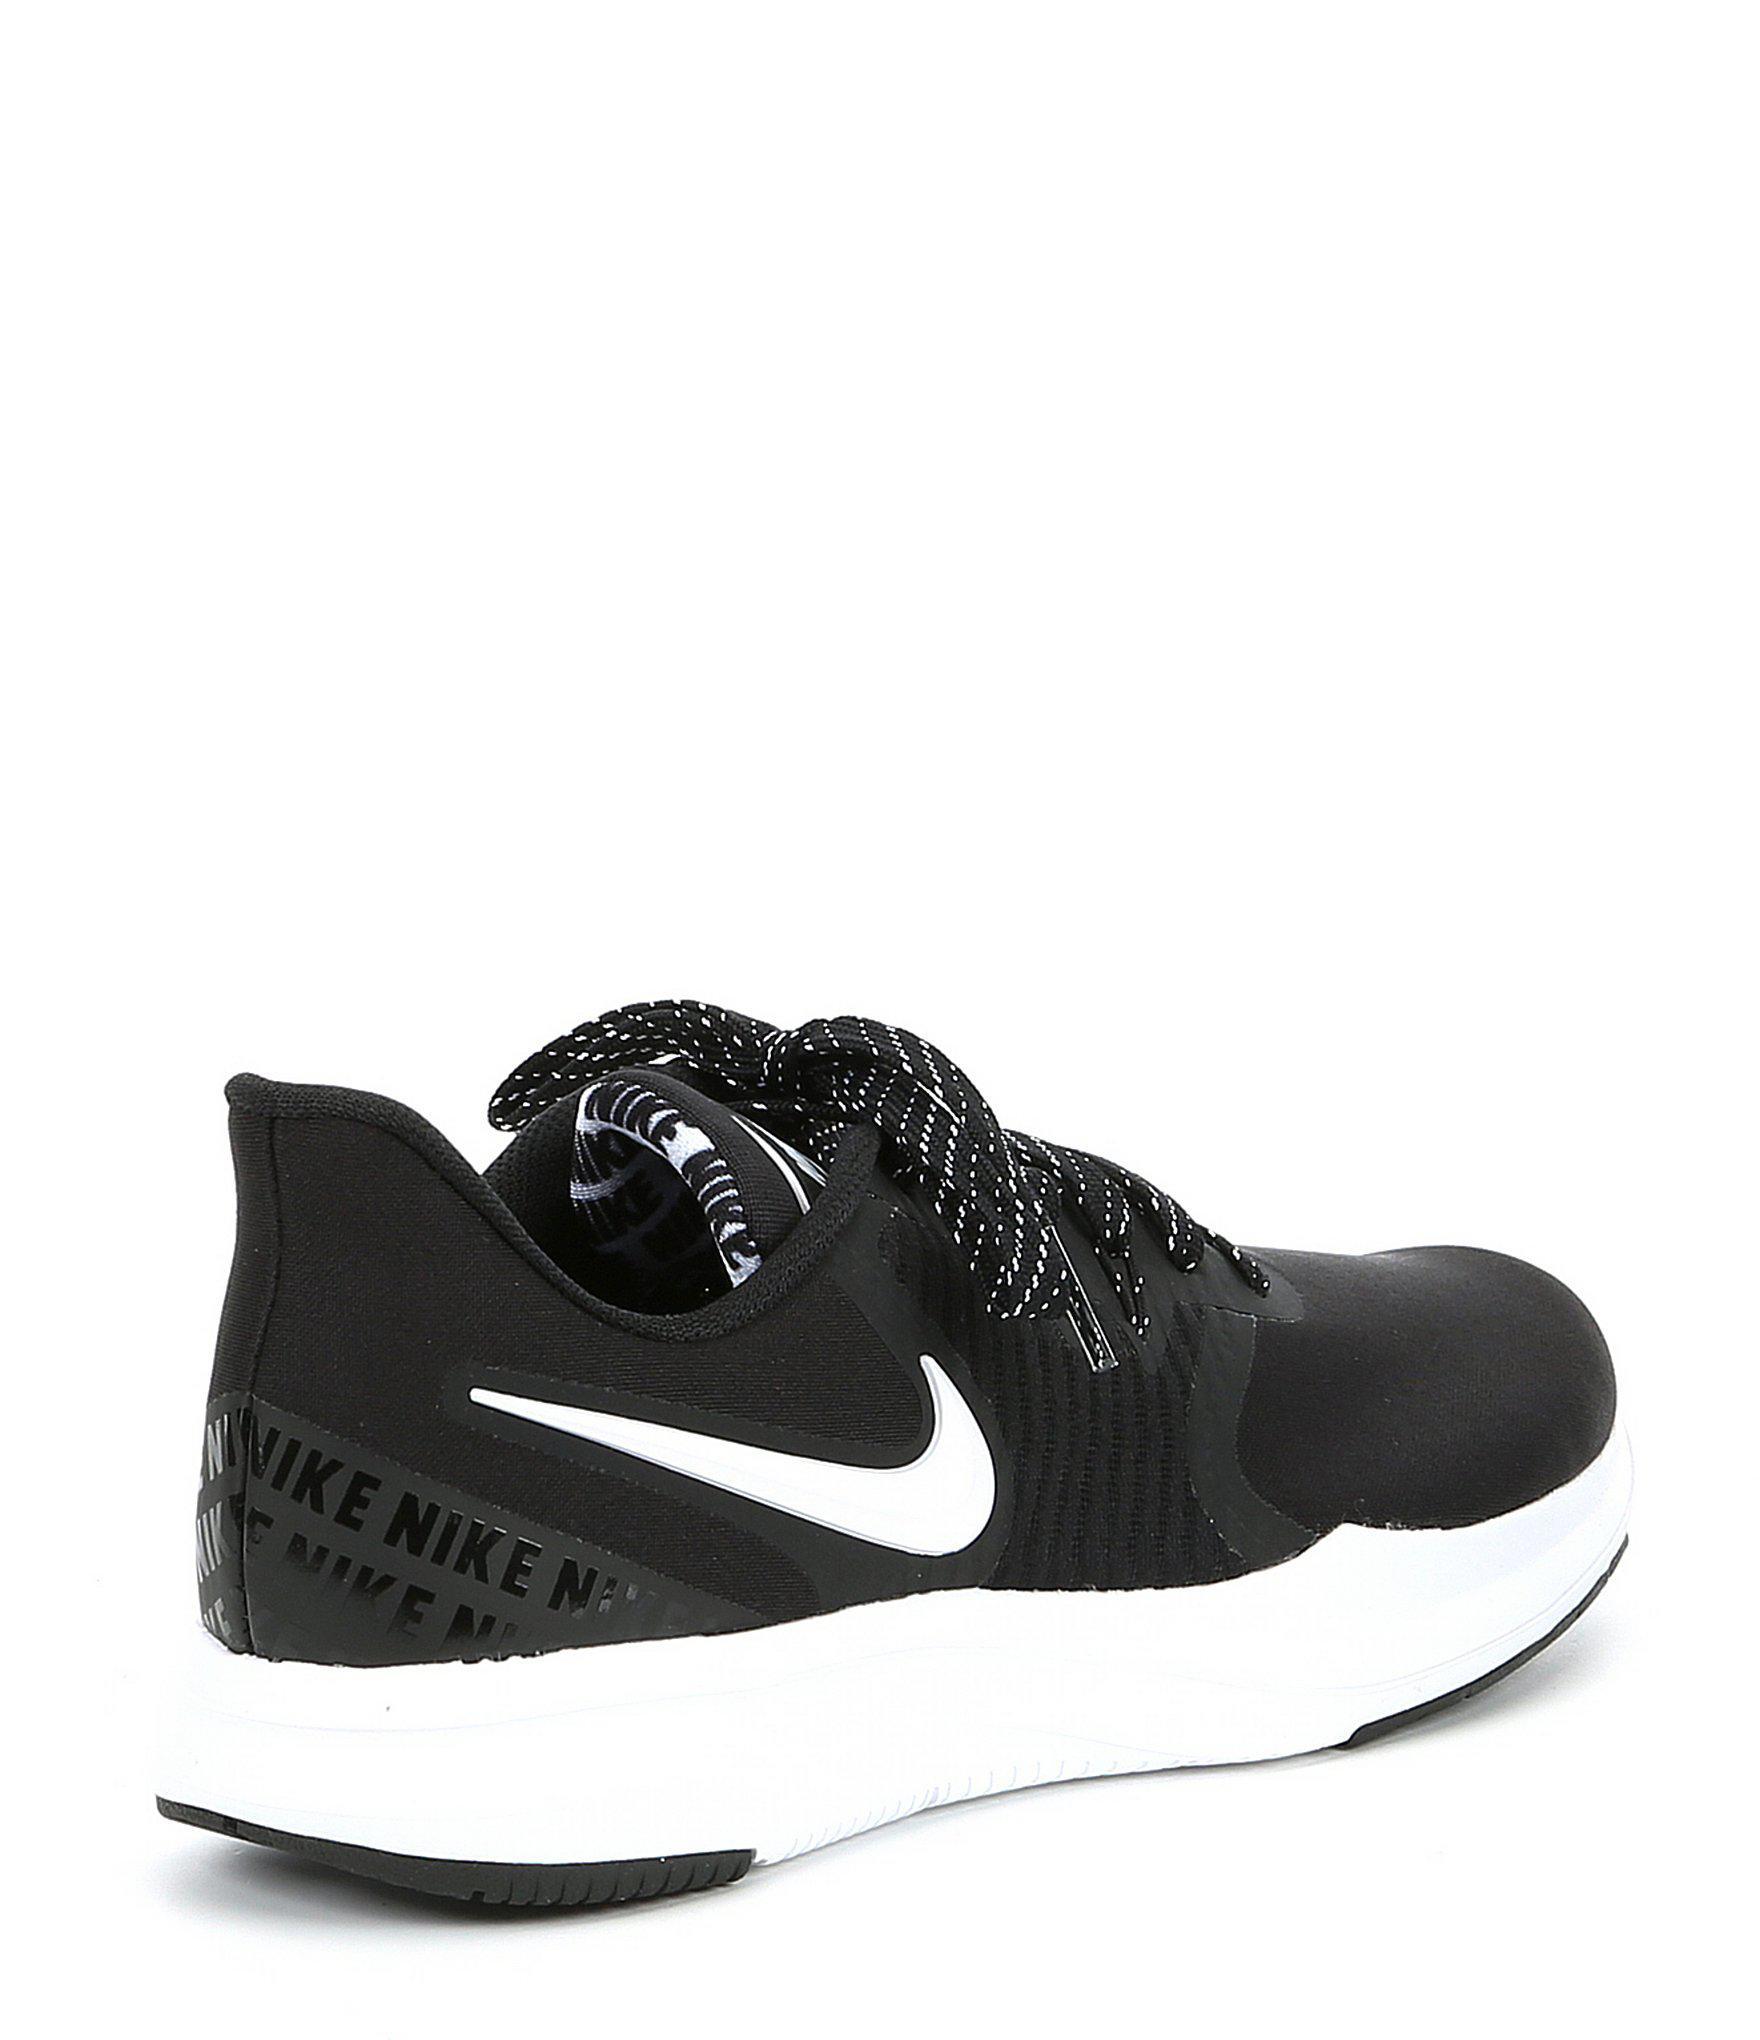 5a6c22df59a6 Nike - Black Women s In-season Tr 8 Print Training Shoe - Lyst. View  fullscreen